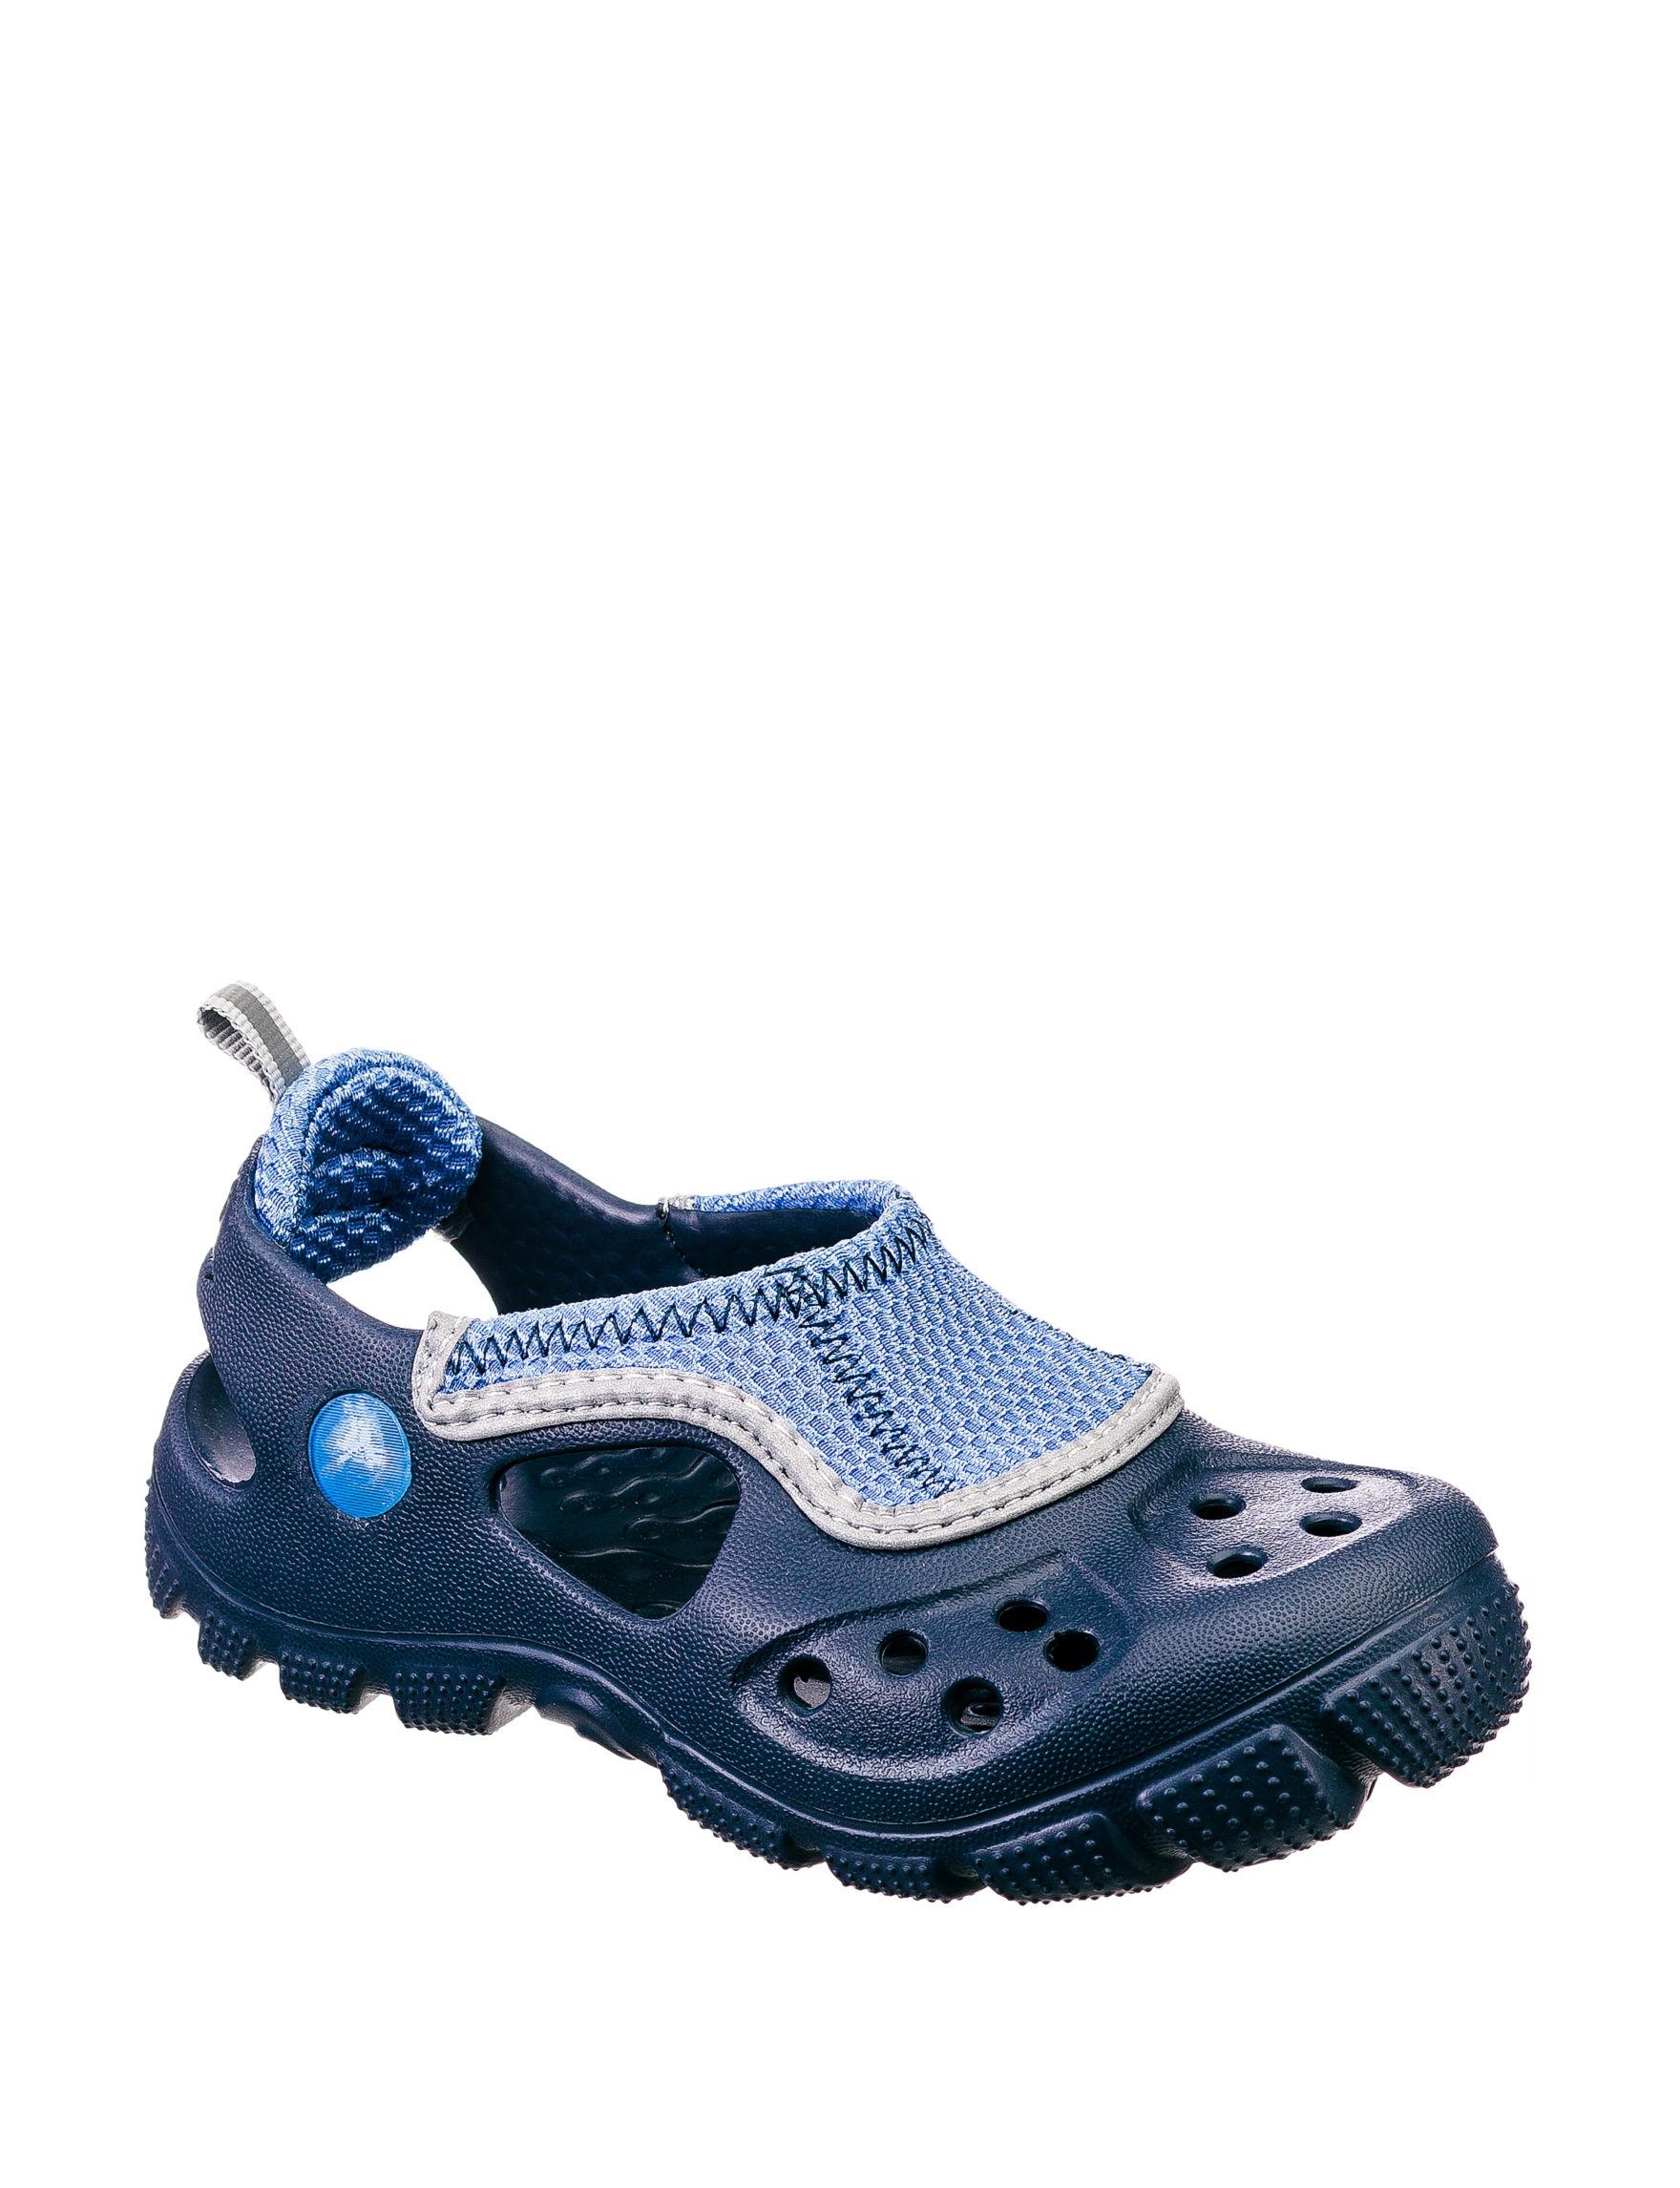 ce188f56cf8029 ... UPC 887350003116 product image for Crocs Micah II Clogs - Toddler Boys  6-13 ...